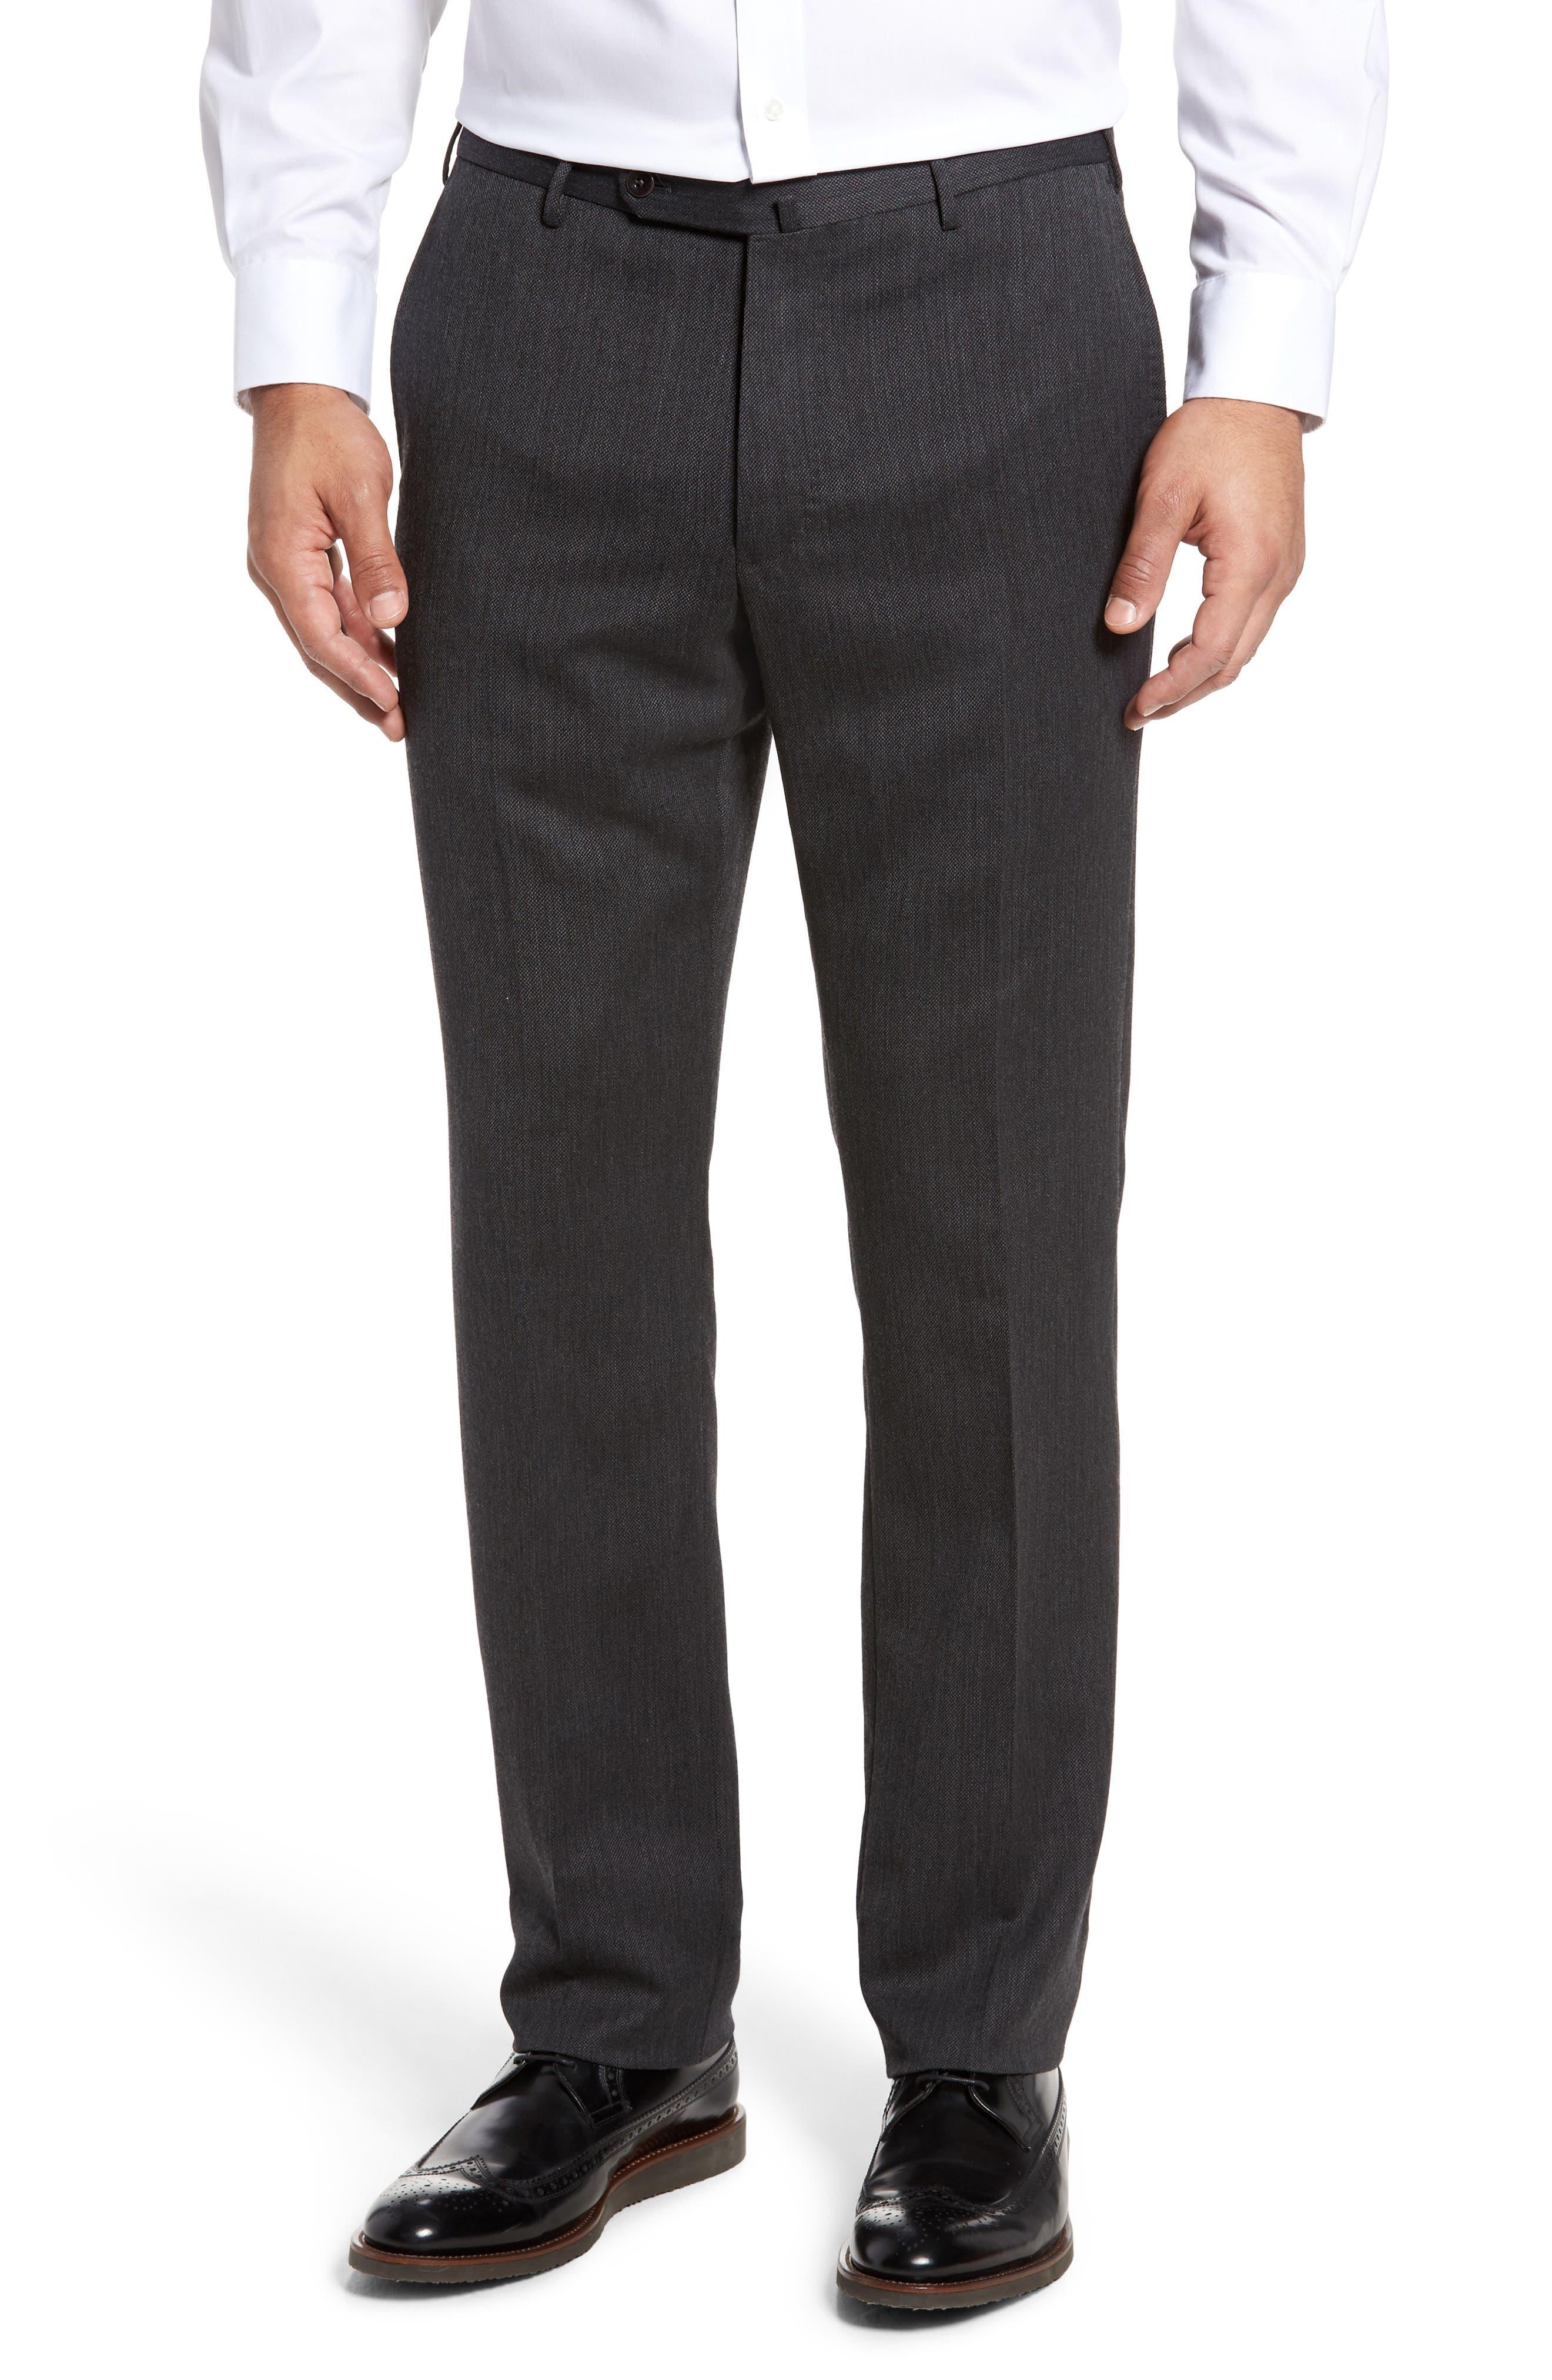 Benson Flat Front Wool Blend Trousers,                             Main thumbnail 1, color,                             025